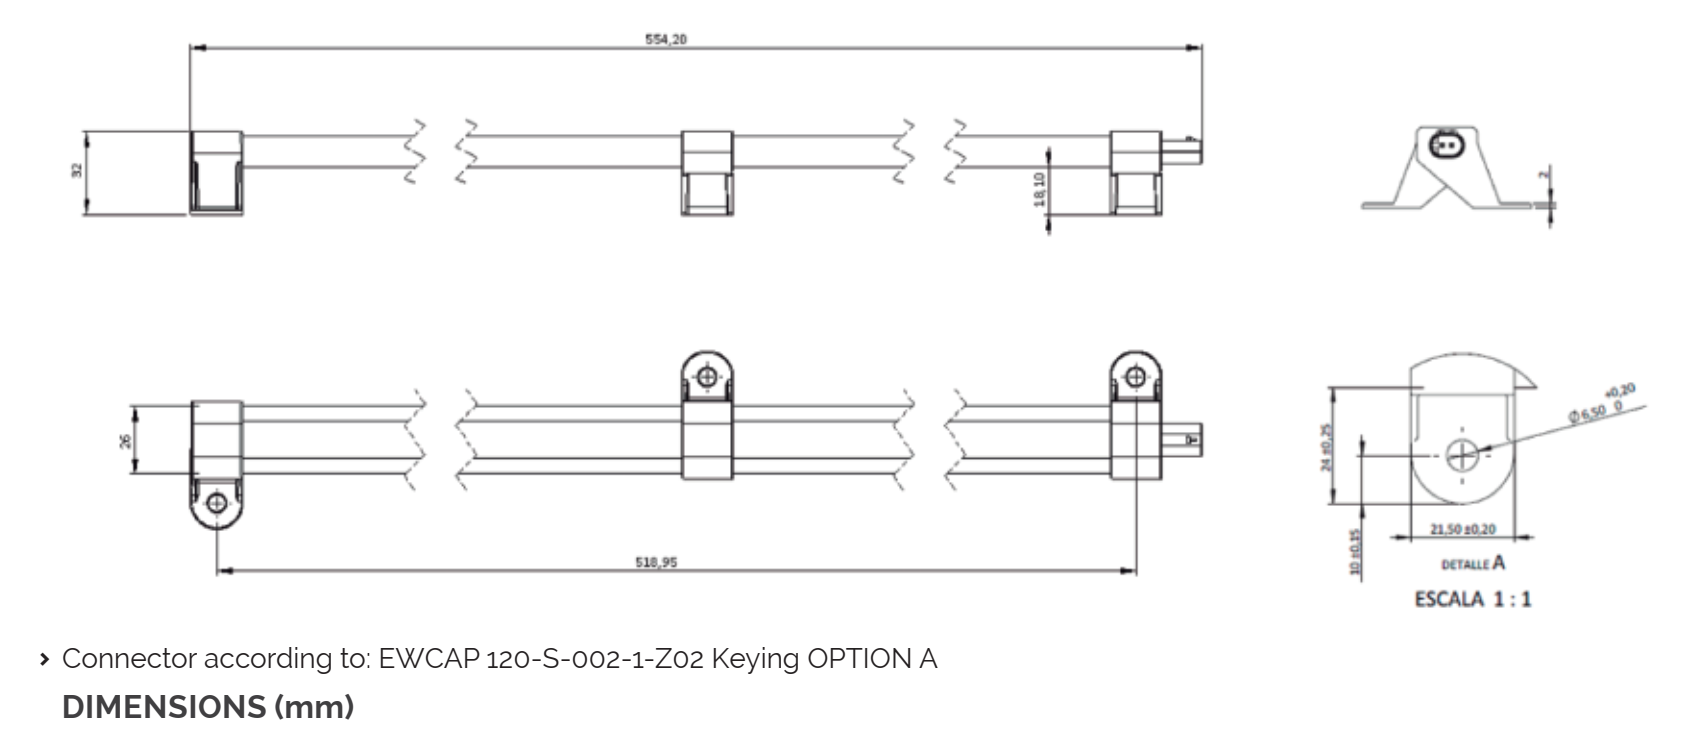 KGEA AFULR dimensions